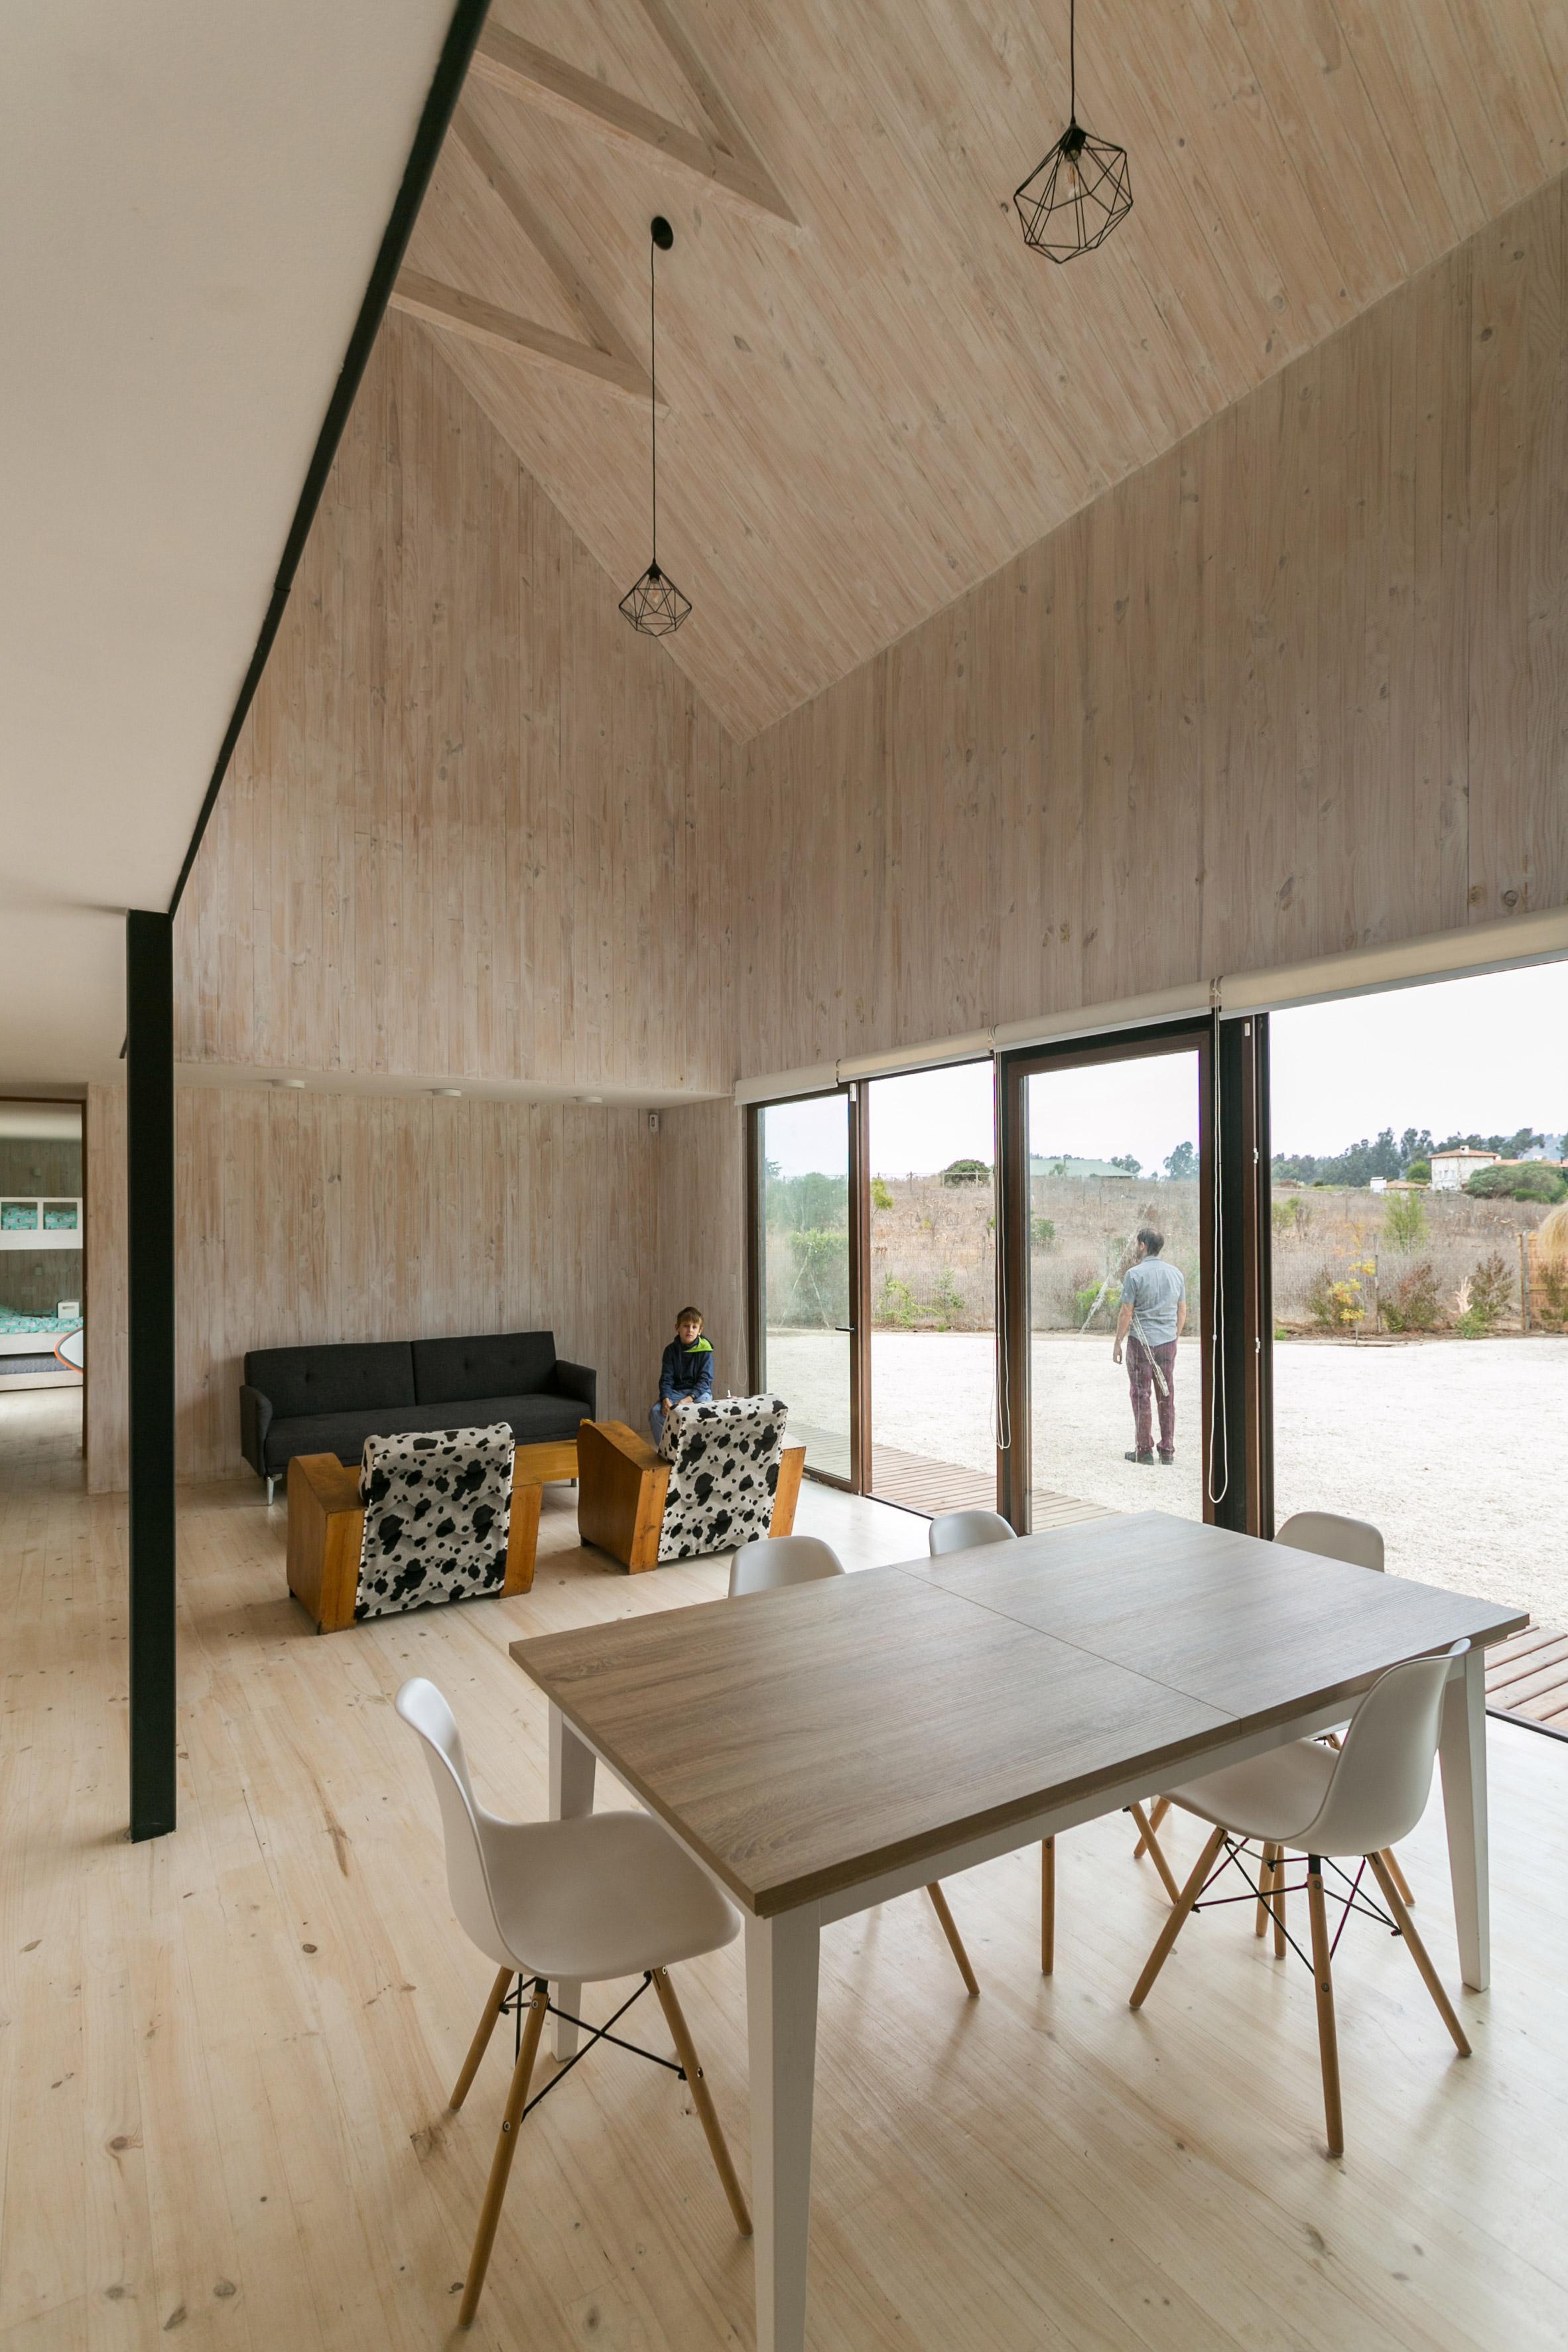 shotgun-house-alejandro-soffia-architecture-black-wood-chile_dezeen_2364_col_0.jpg